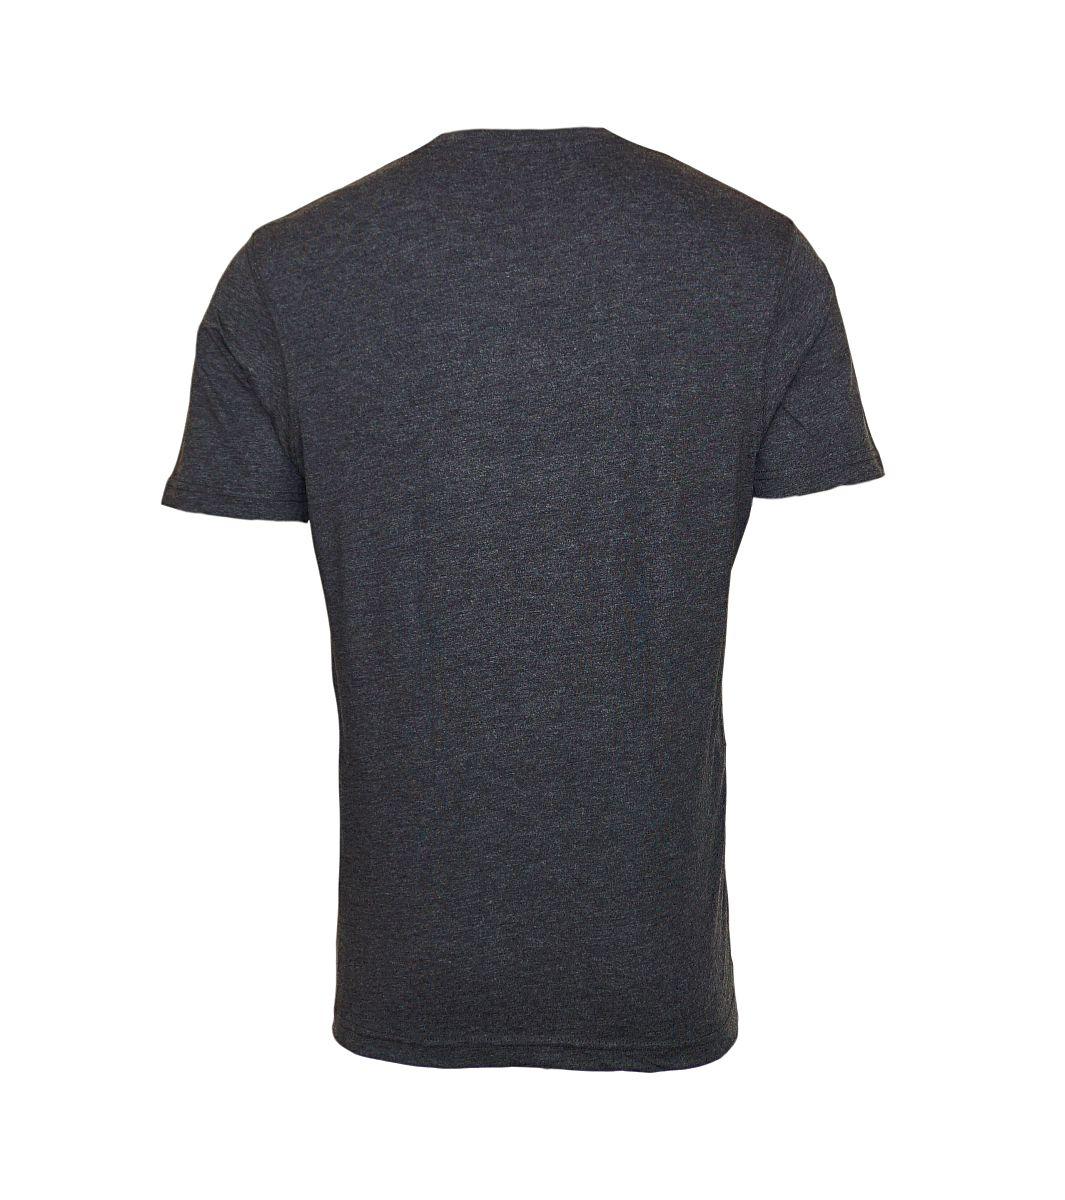 Daniel Hechter 2er Pack T-Shirts Rundhals 76001 172972 970 anthrazit melange SH17-DH2P